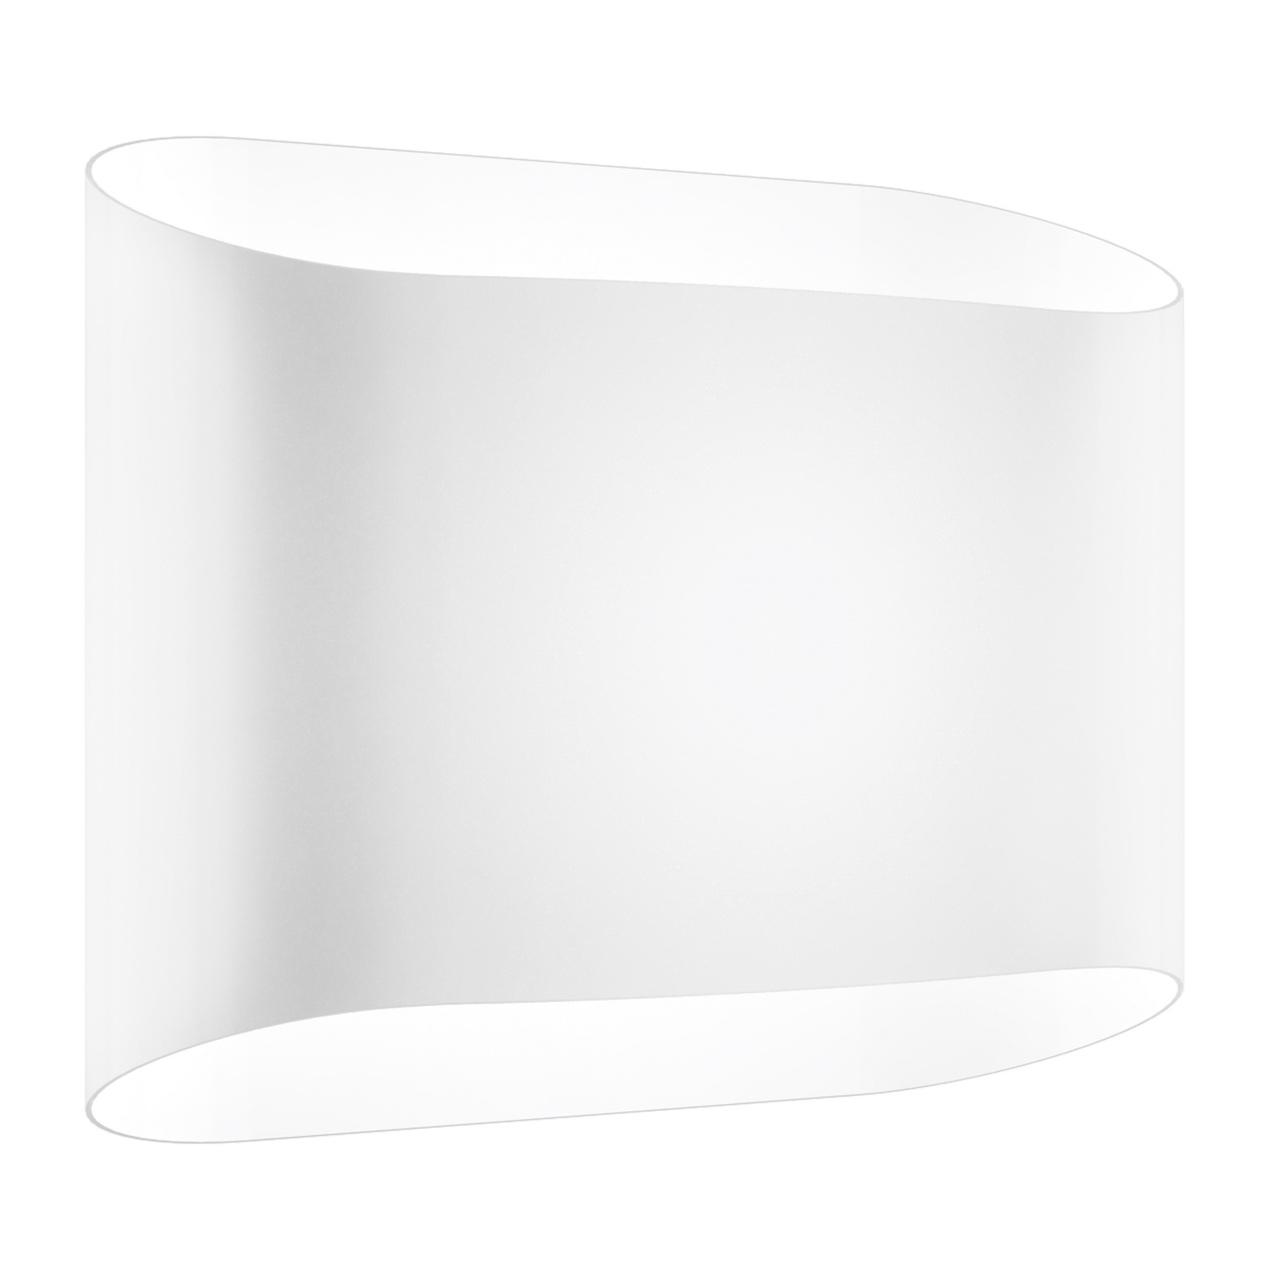 Светильник настенный Muro 2х40W G9 хром / белый Lightstar 808620